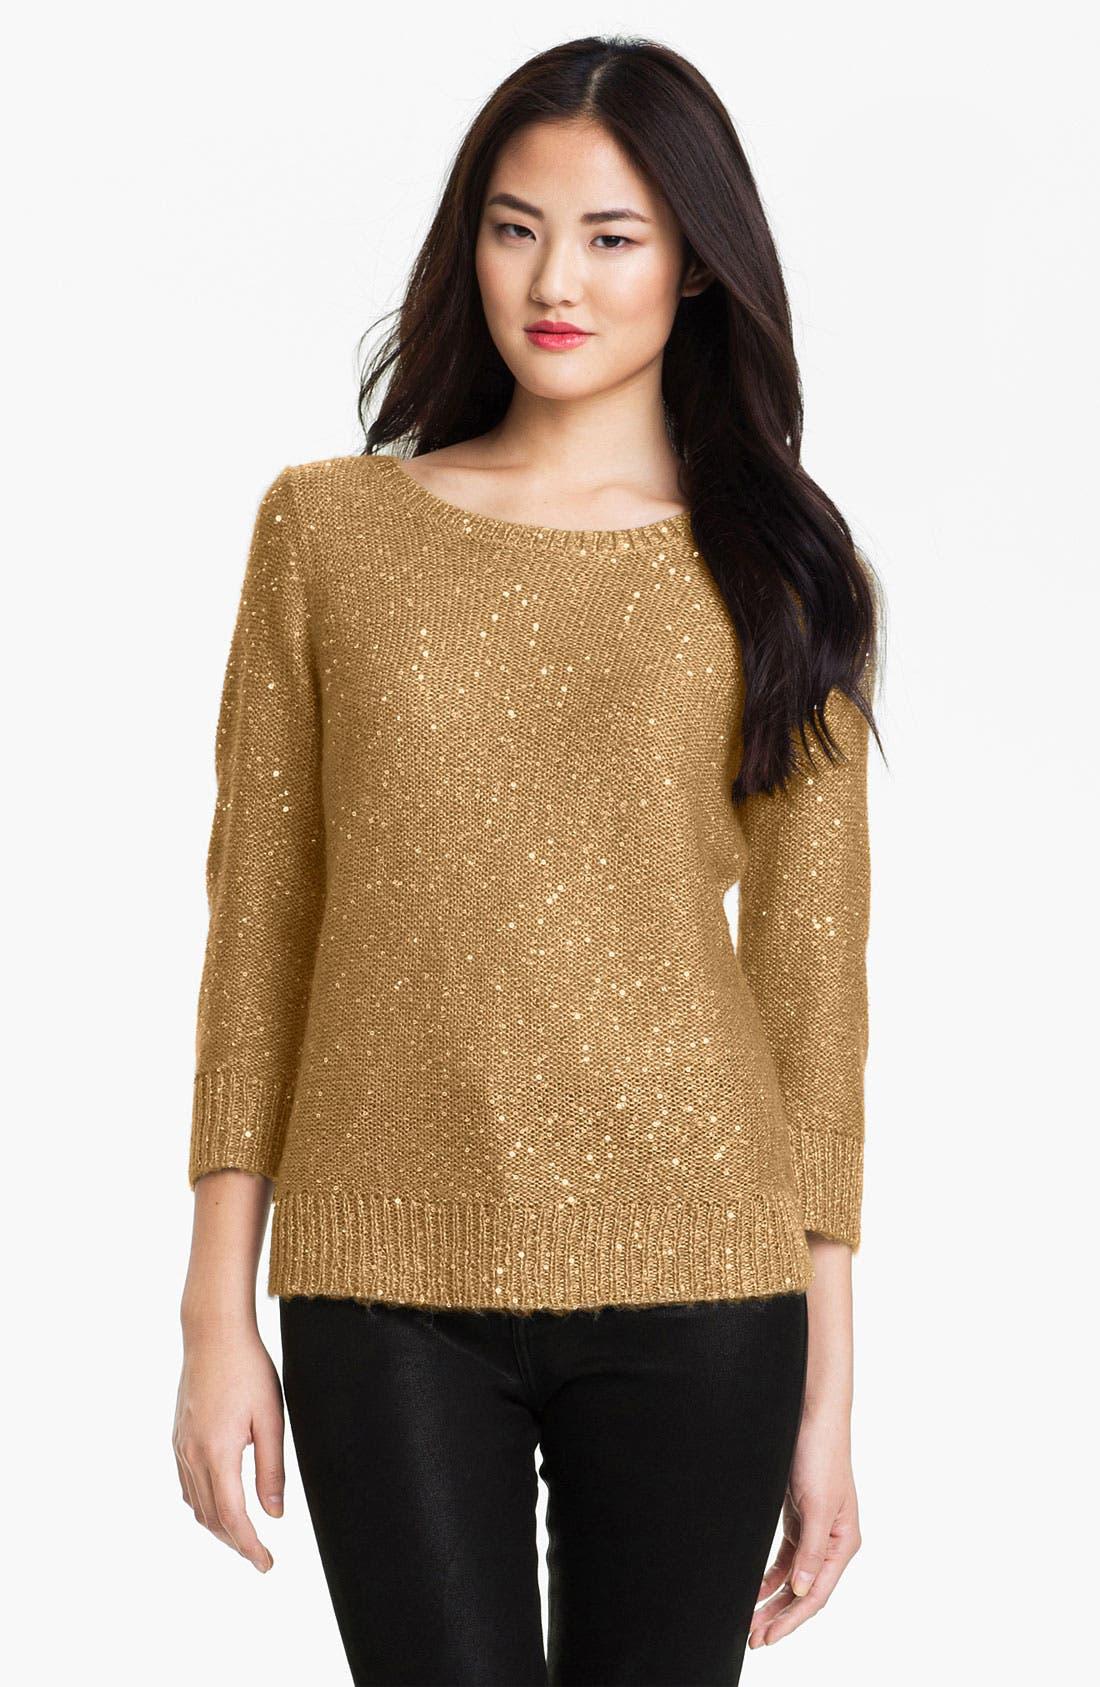 Alternate Image 1 Selected - Anne Klein Bateau Neck Sequin Sweater (Petite)